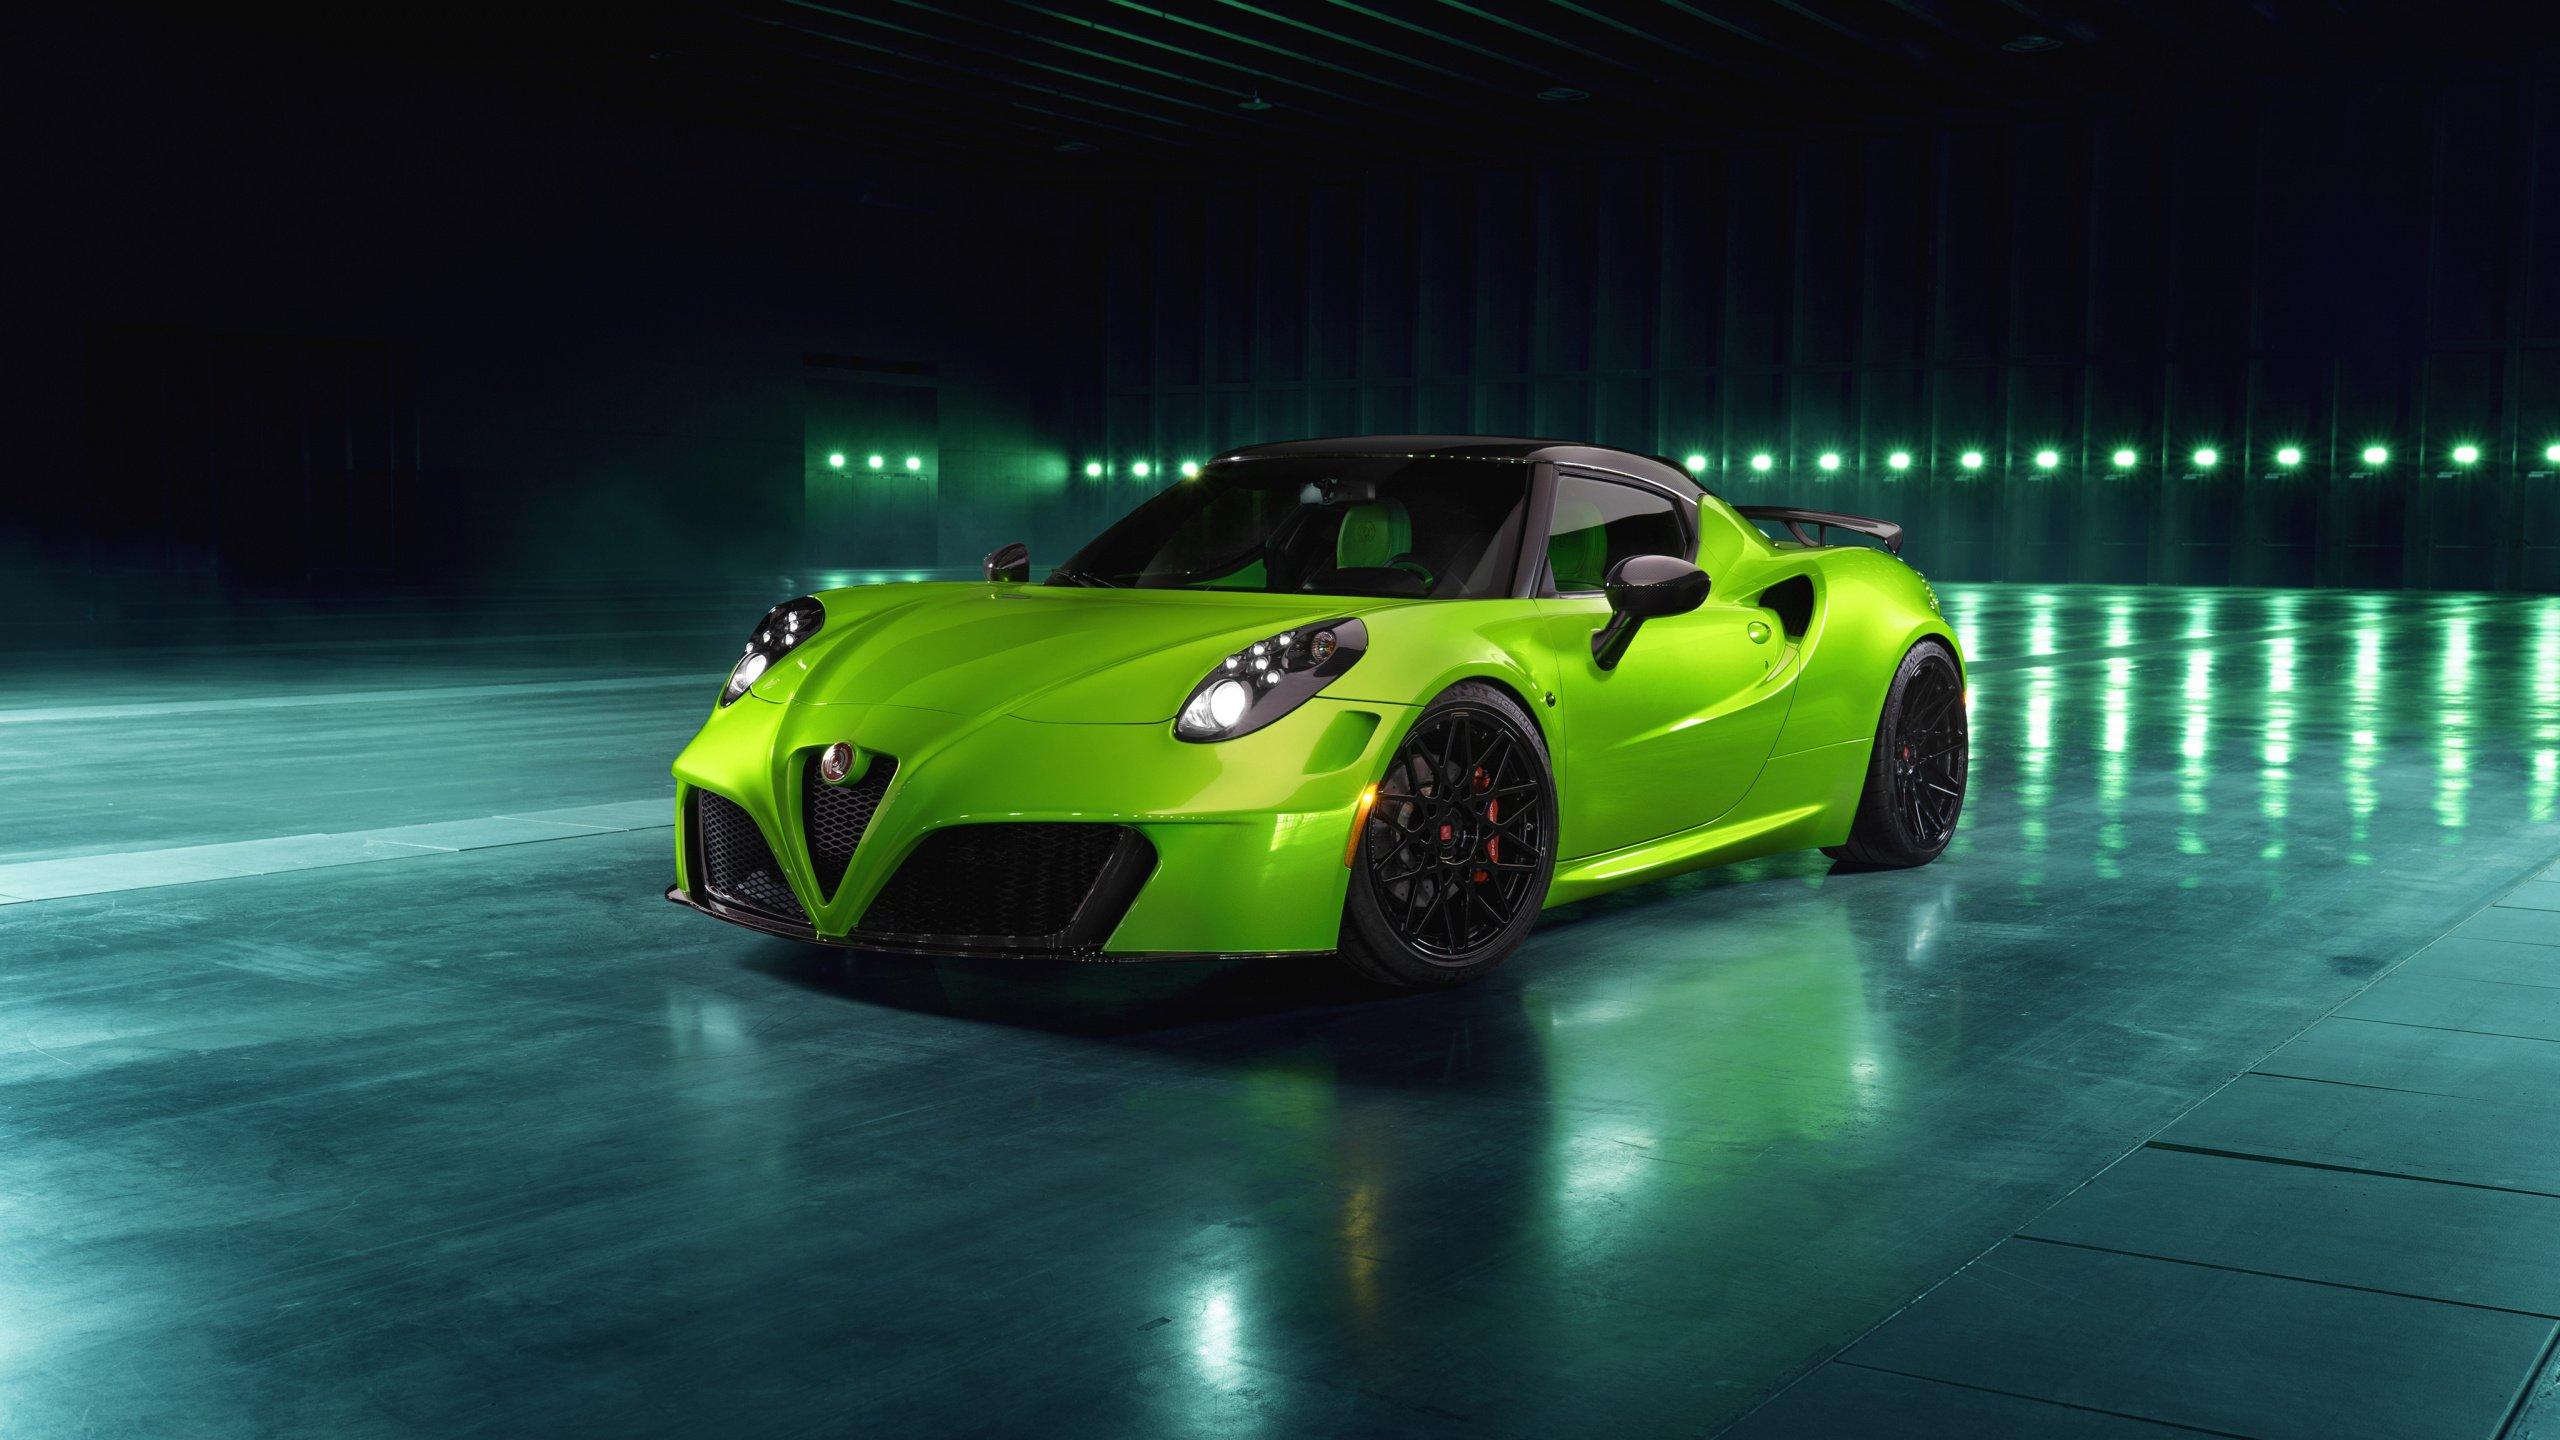 Alfa Romeo 4c Centurion Green Arrow Hd Wallpaper